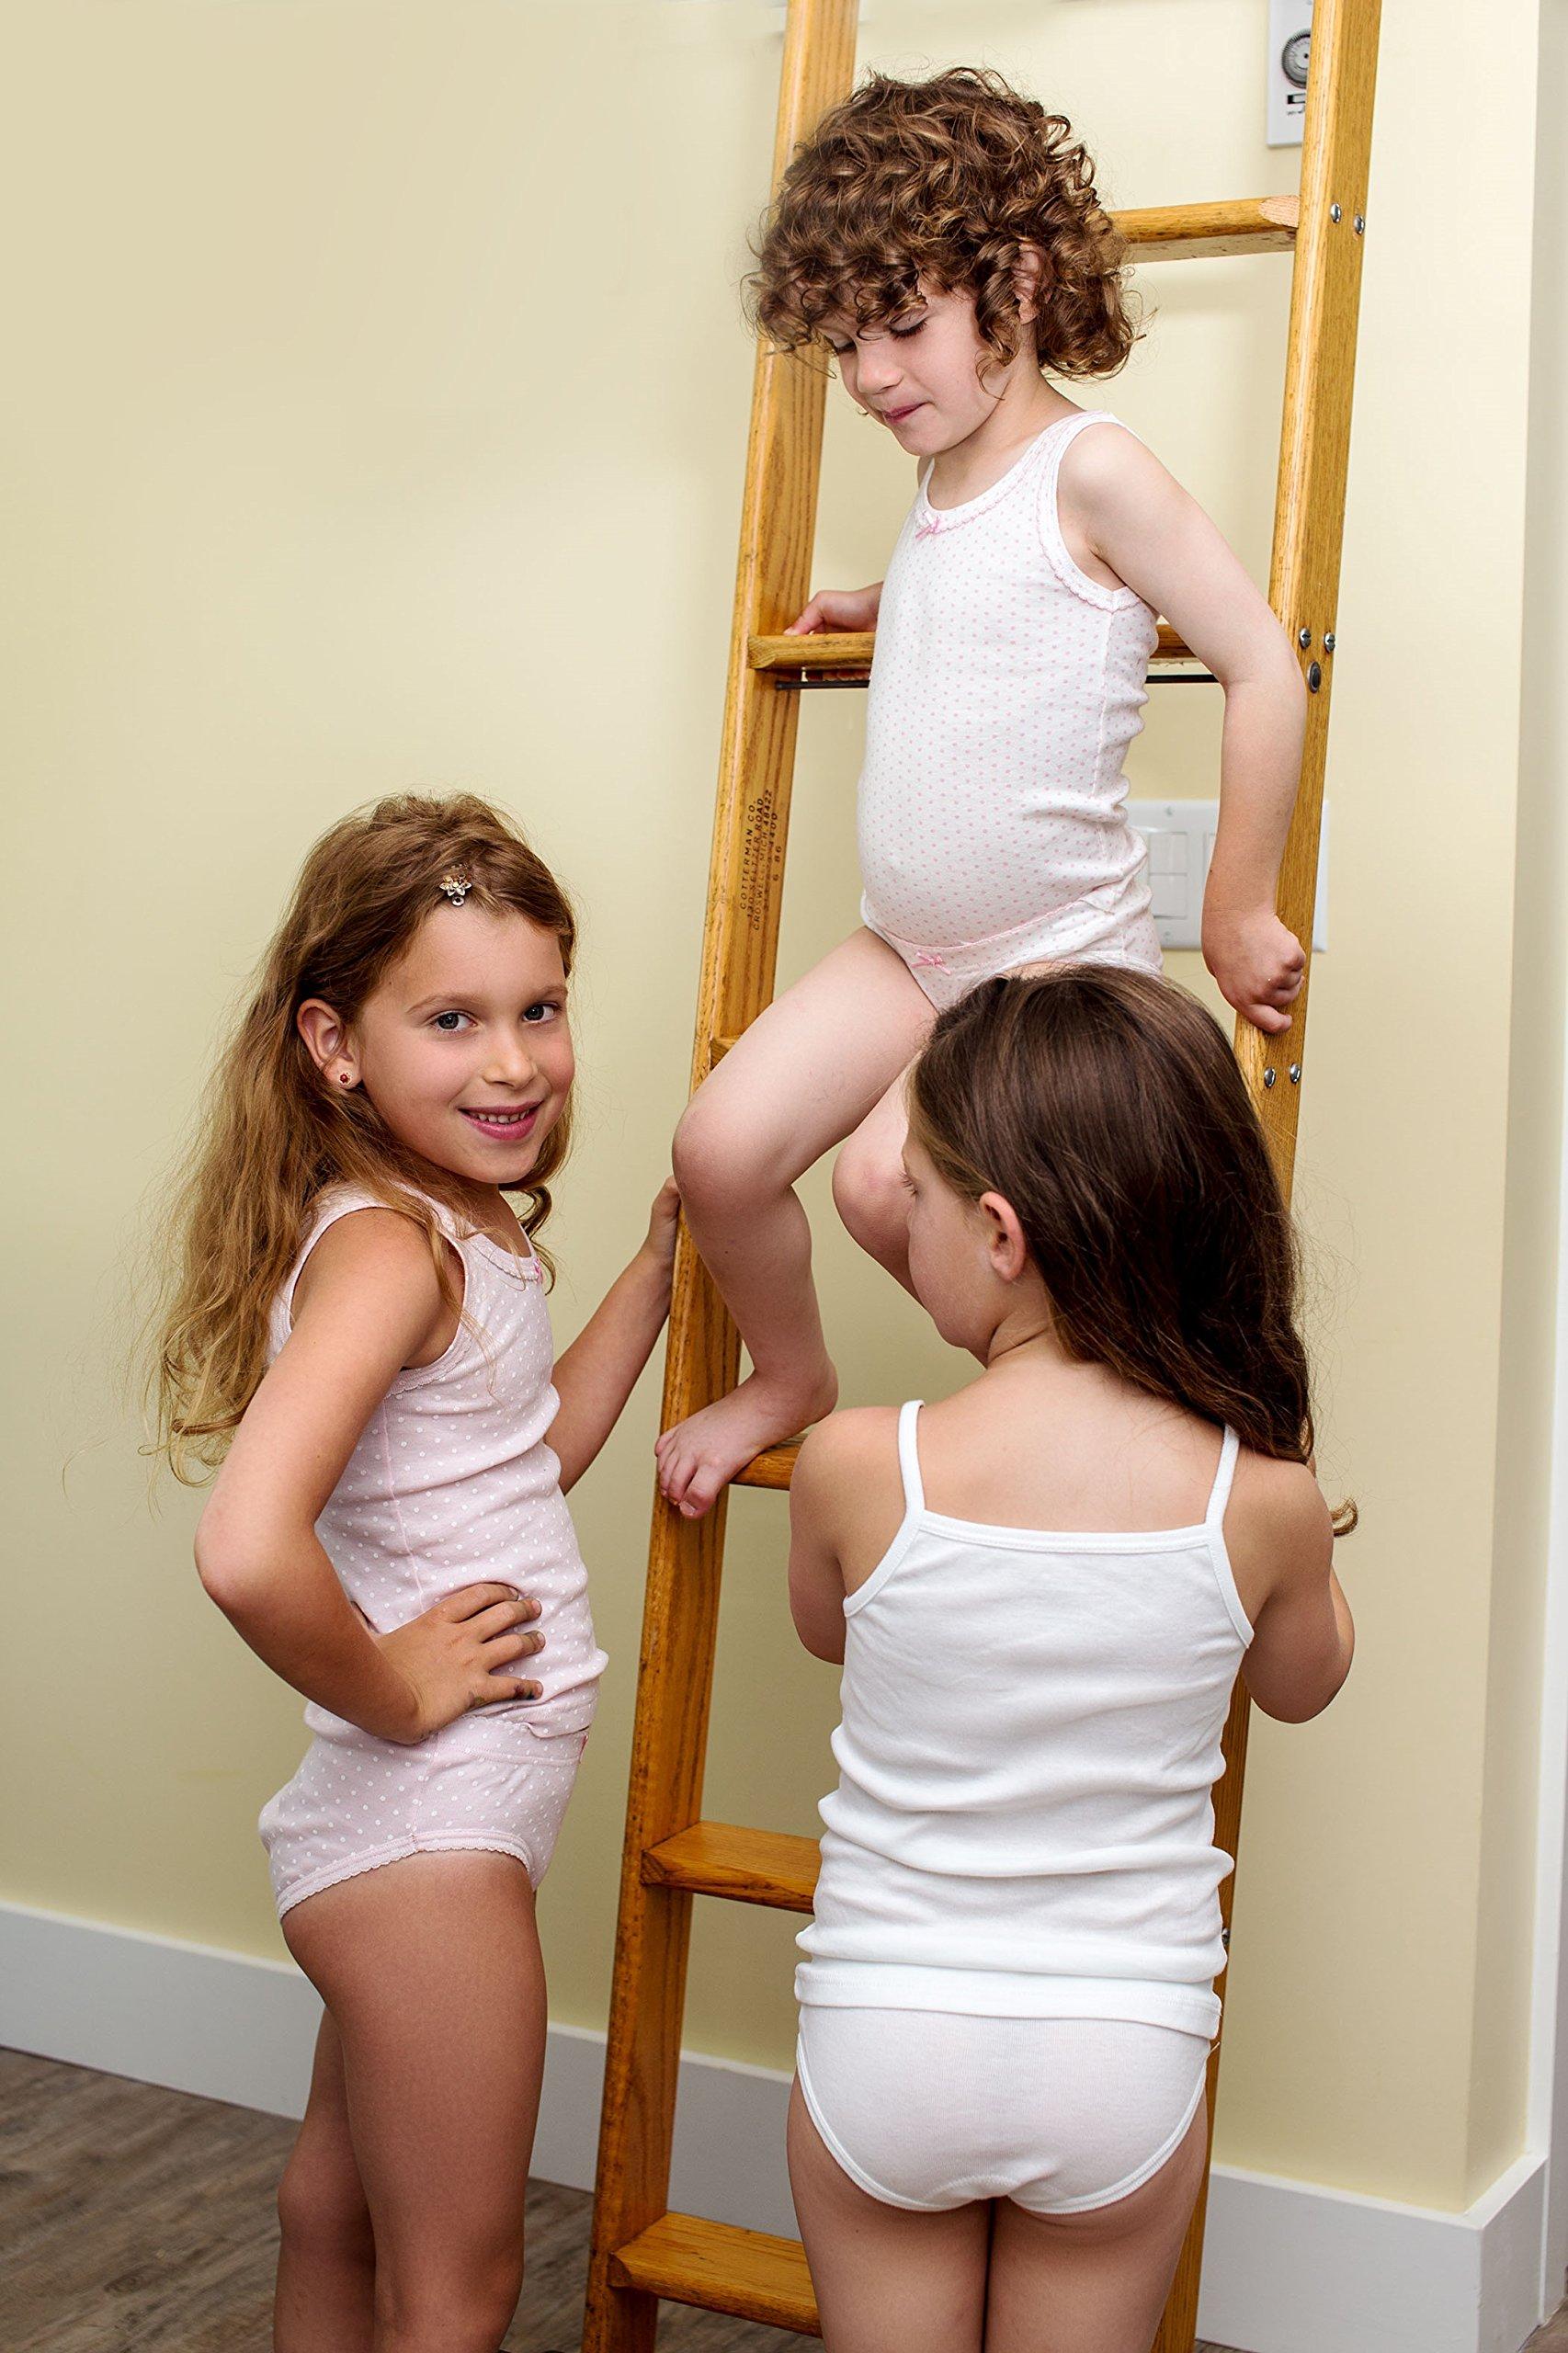 Amoureux Bebe Girls Cami Undershirts- Tagless Cotton Tank Tops-Pink/White, 3 Pk (8-9 Yrs) by Amoureux Bebe (Image #5)